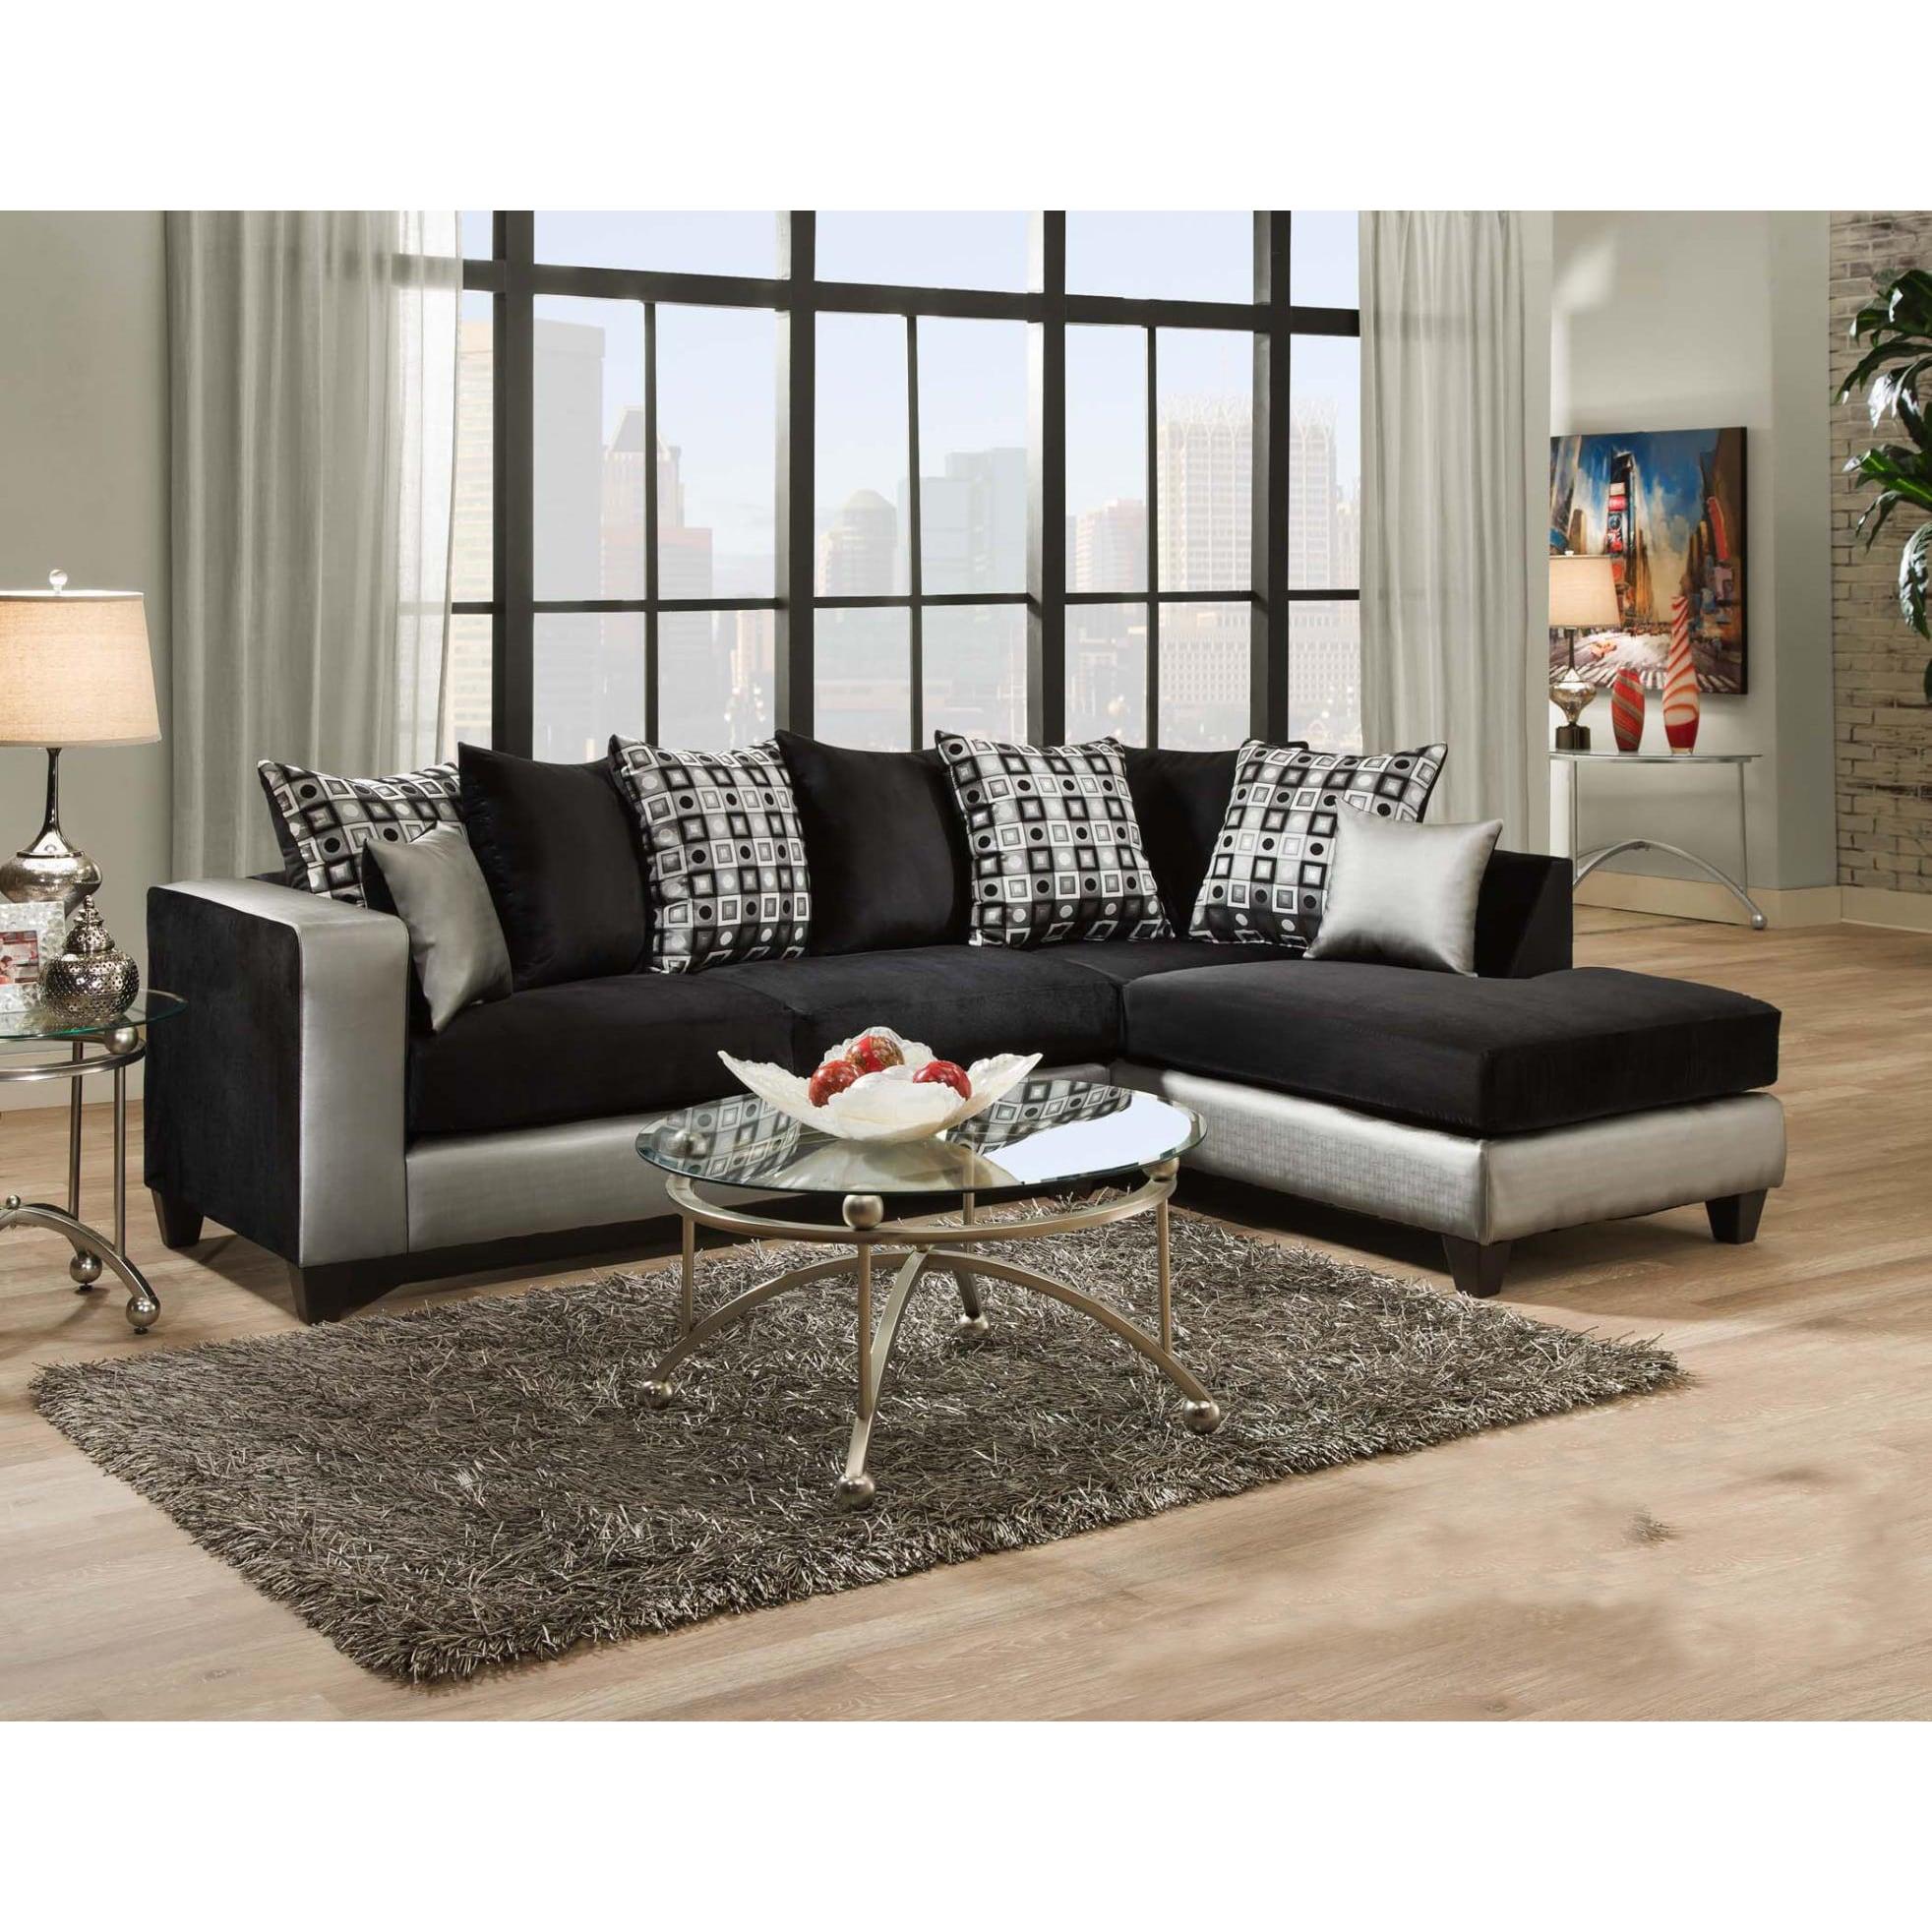 Sofa Trendz Darlene Two-Tone Black Fabric Sectional Sofa ...